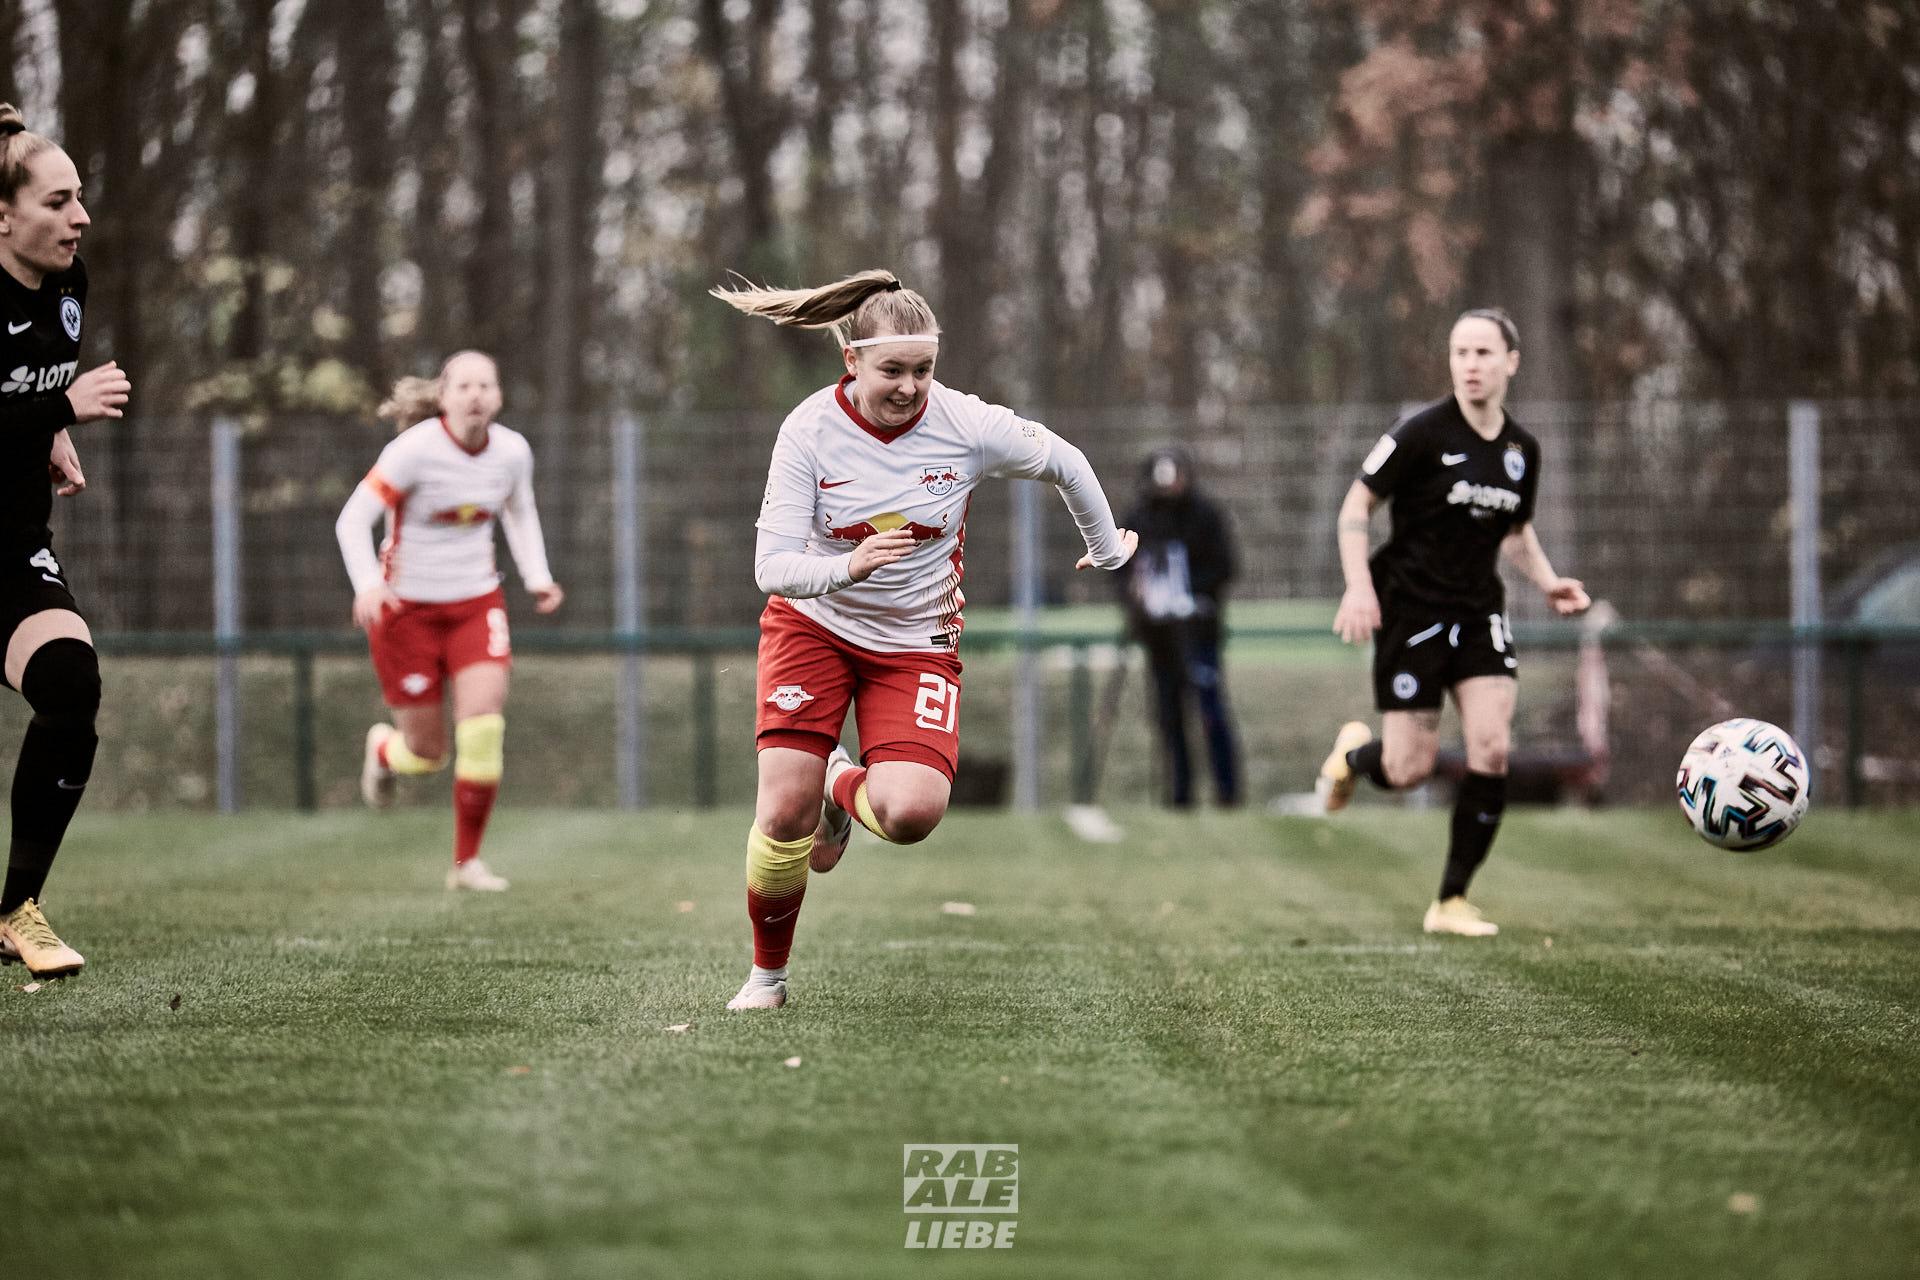 DFB-Pokal: RB Leipzig -vs- Eintracht Frankfurt